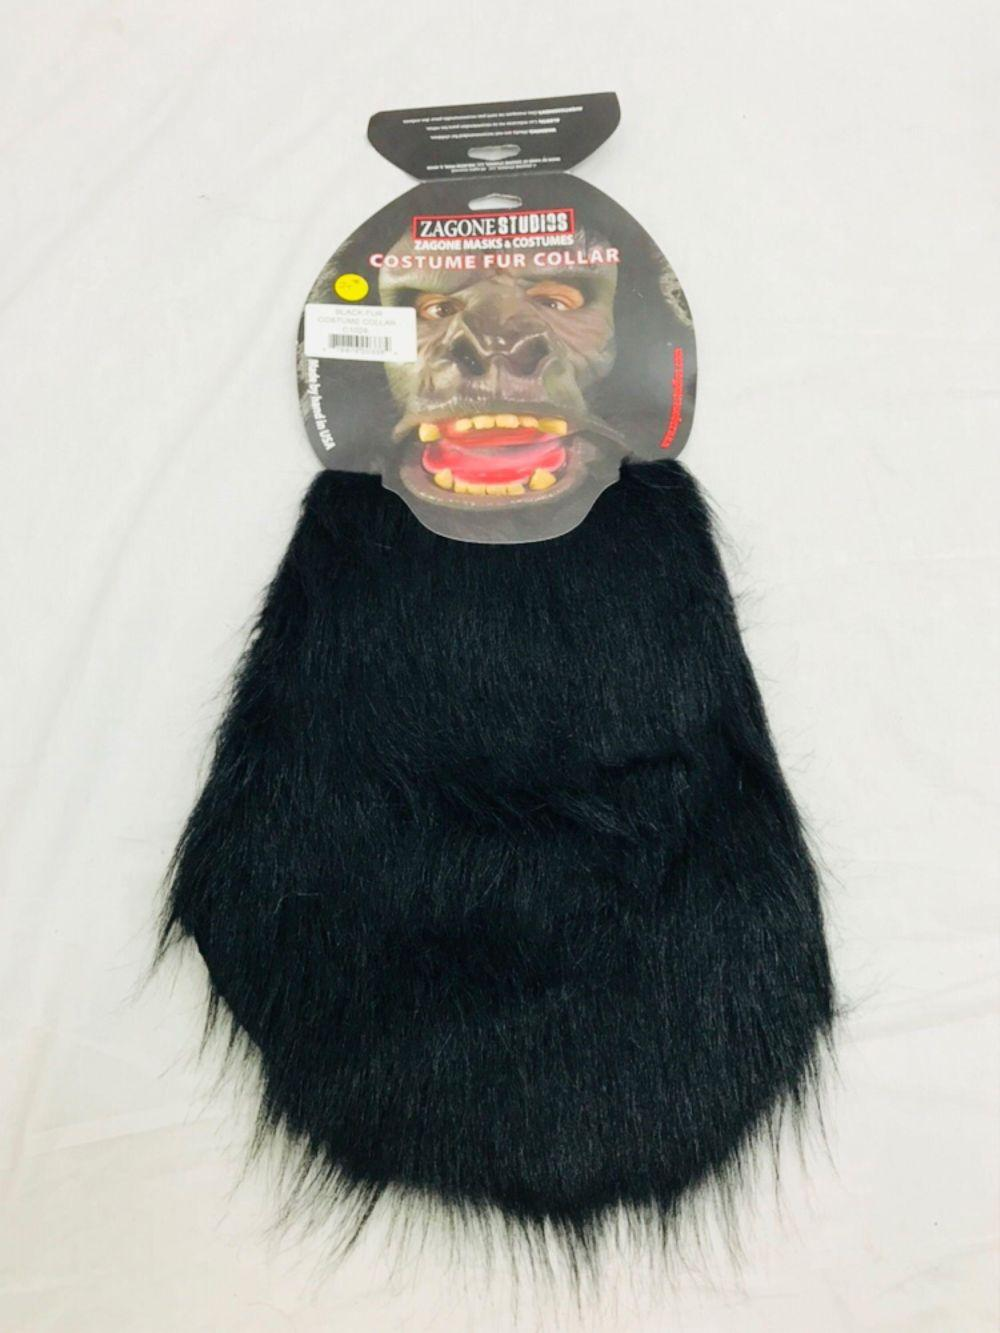 NOS - Halloween Costume Accessory - Fur Collar for Gorilla - Black